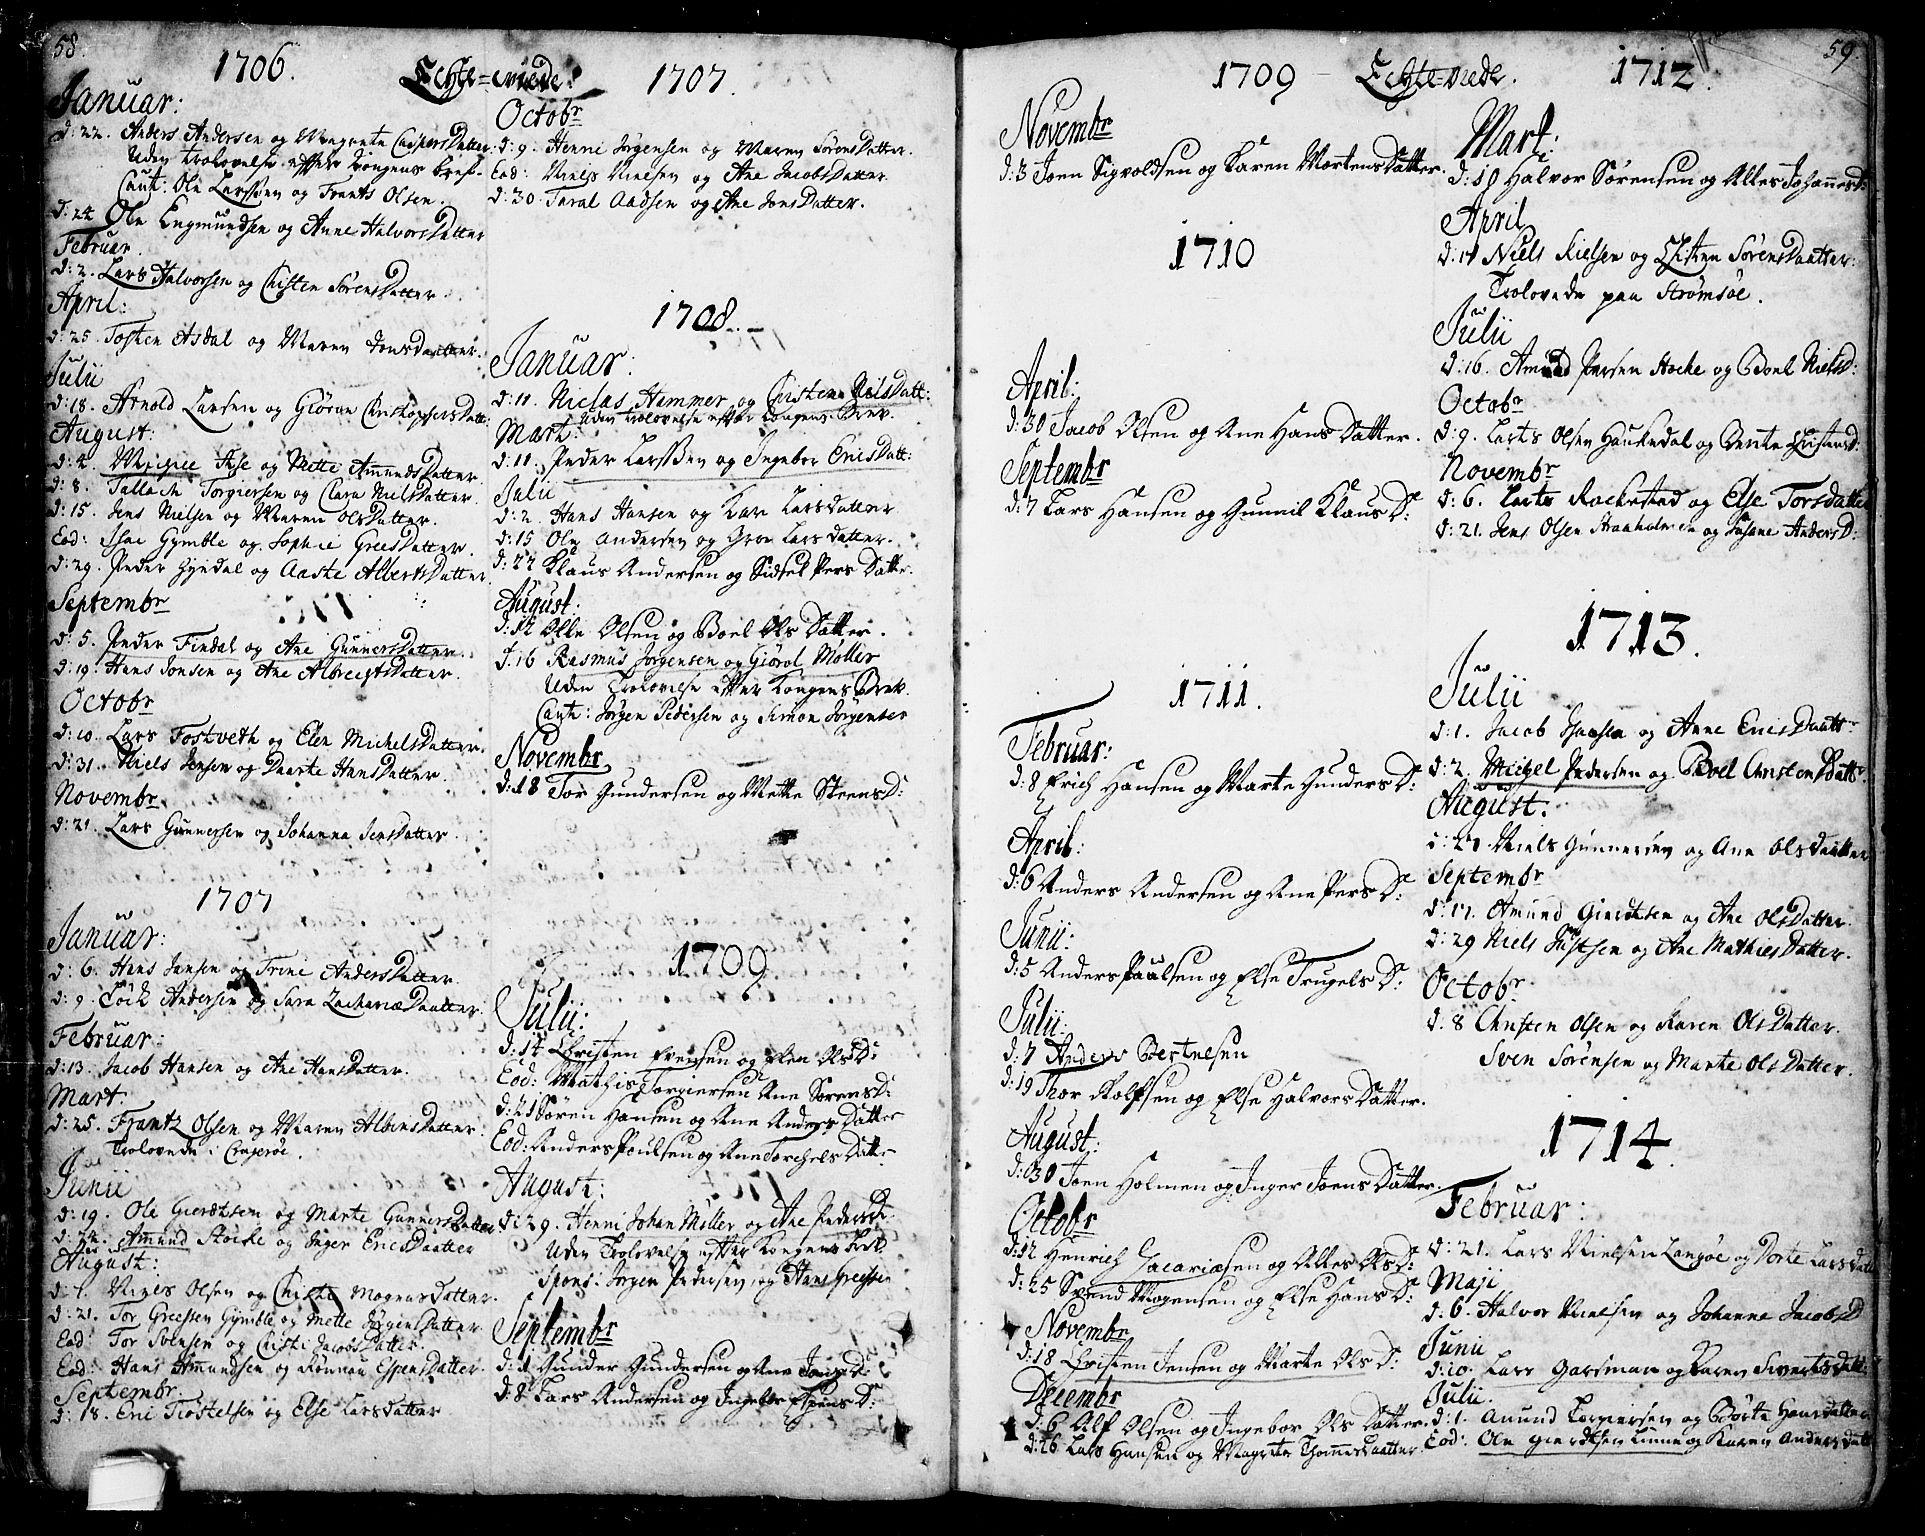 SAKO, Bamble kirkebøker, F/Fa/L0001: Ministerialbok nr. I 1, 1702-1774, s. 58-59